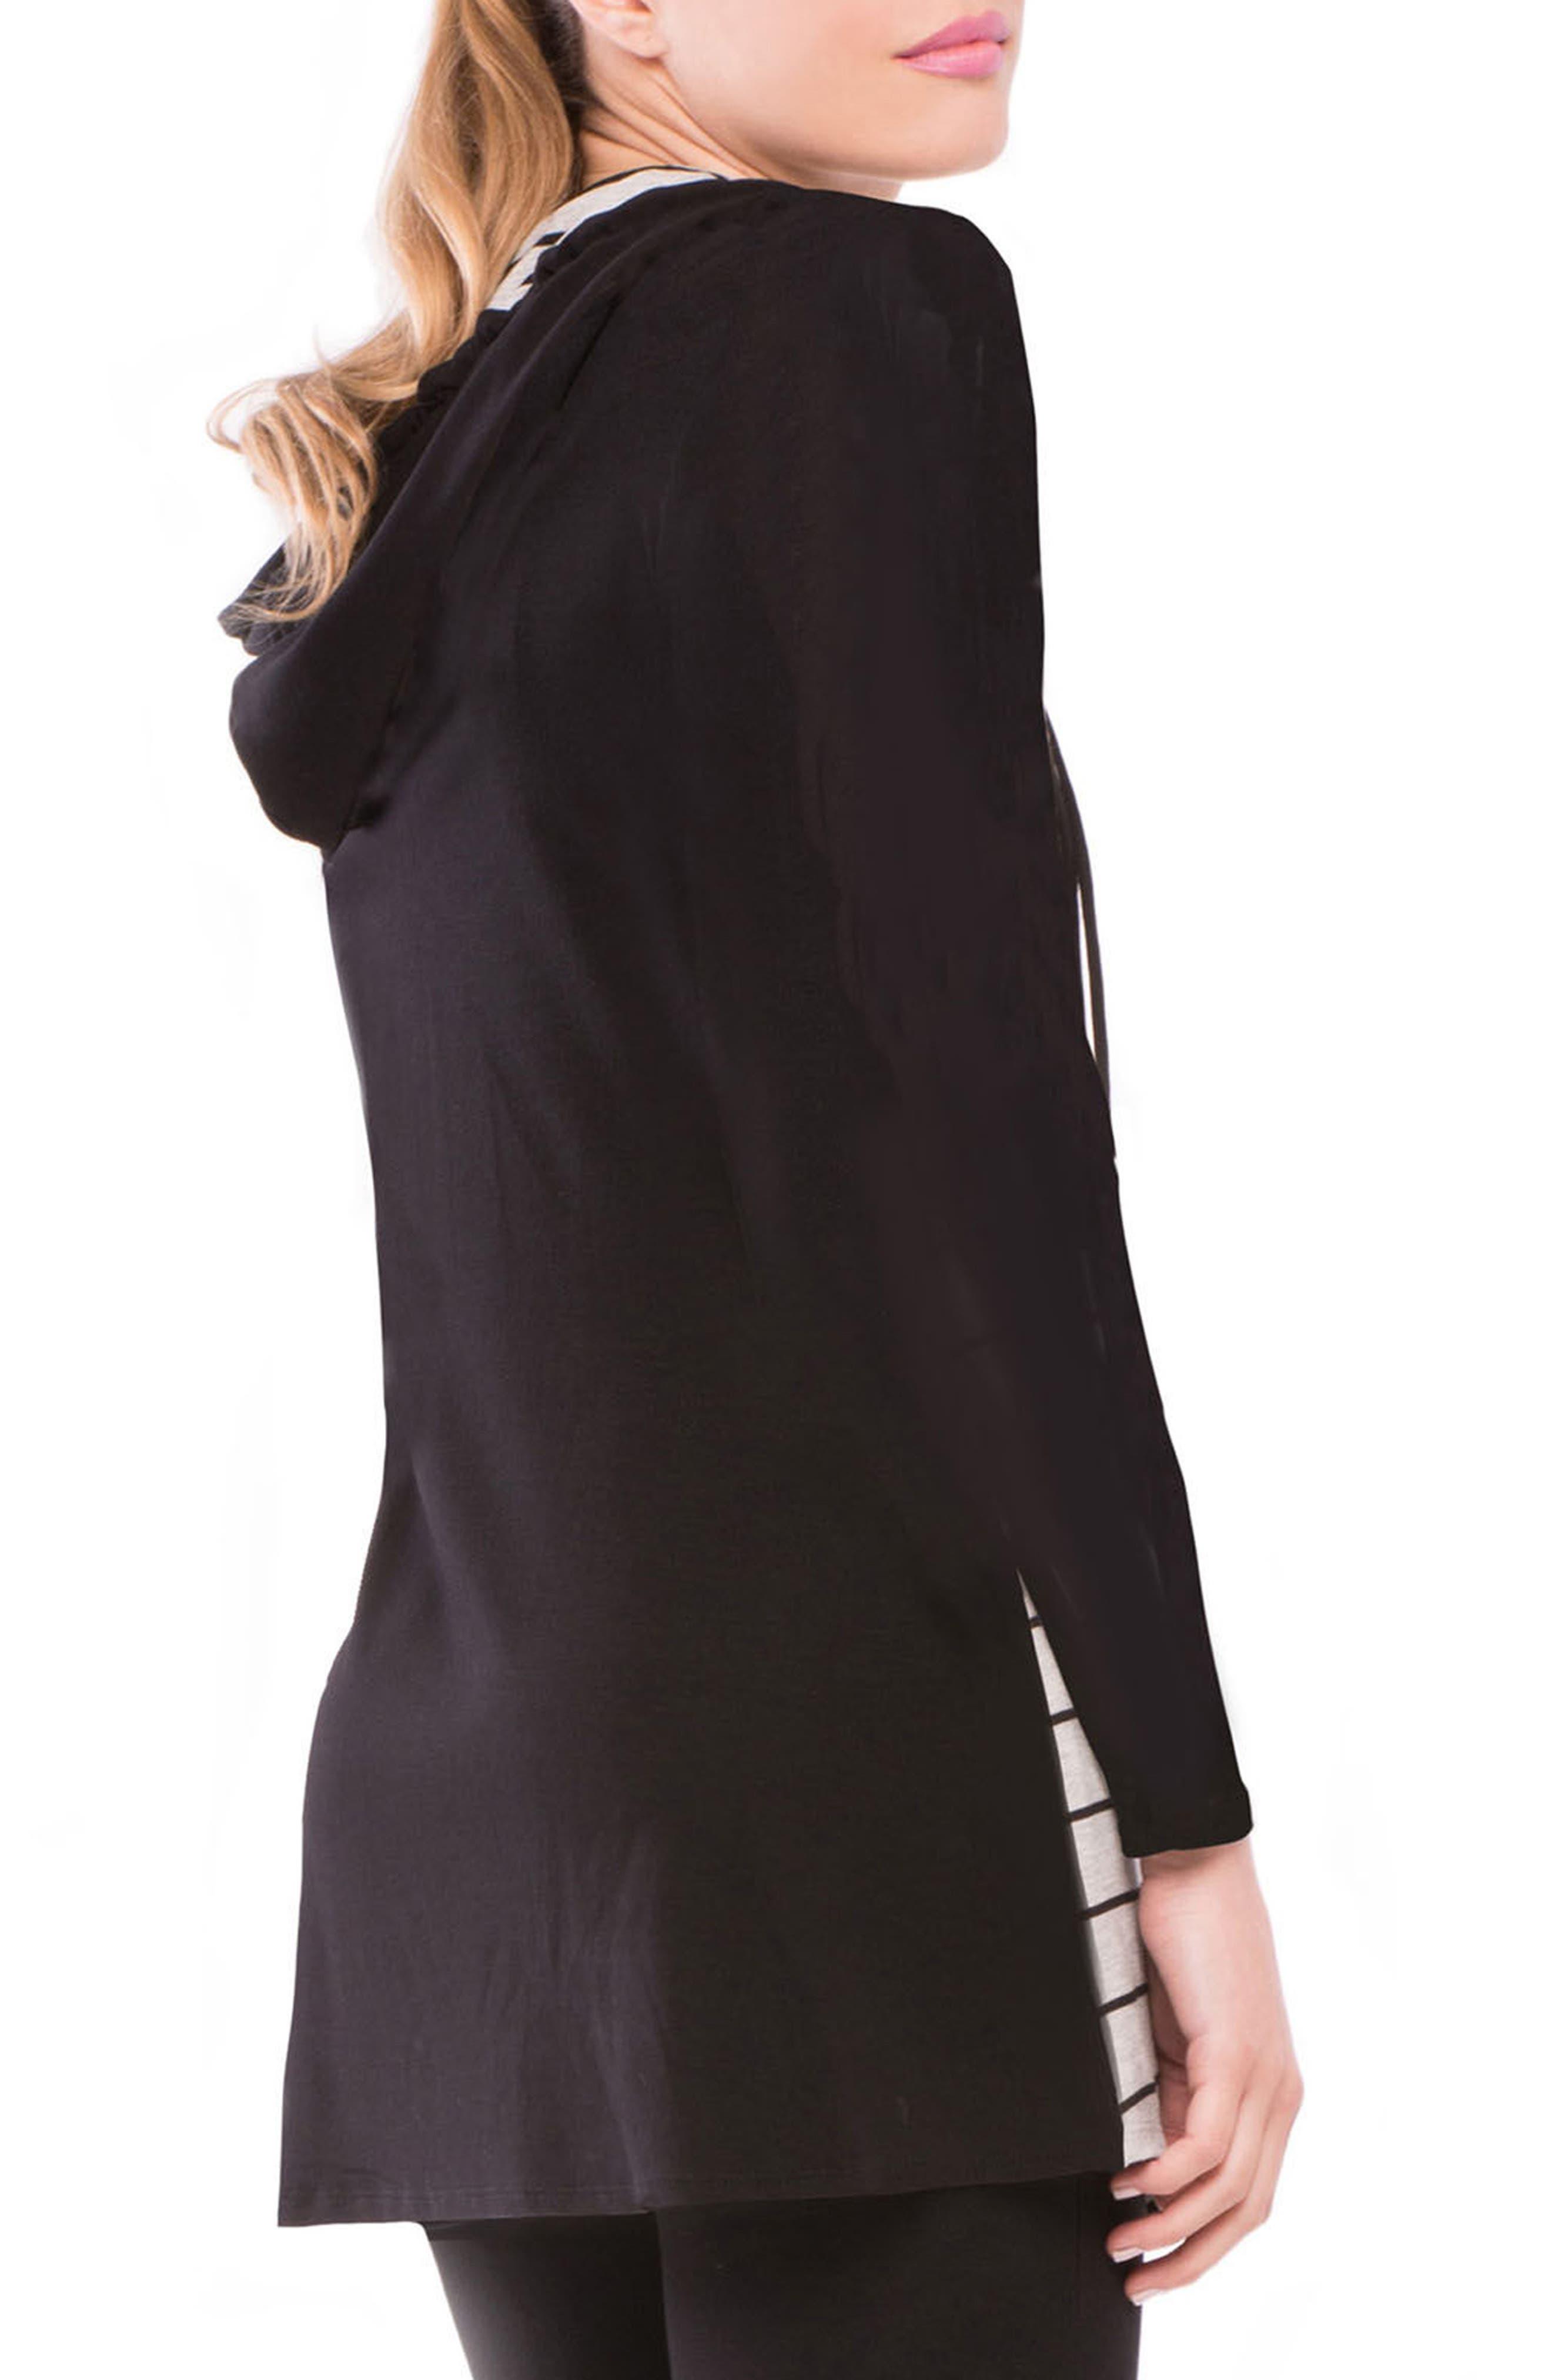 Skye Maternity/Nursing Hooded Tunic,                             Alternate thumbnail 3, color,                             GRAY/ BLACK STRIPE